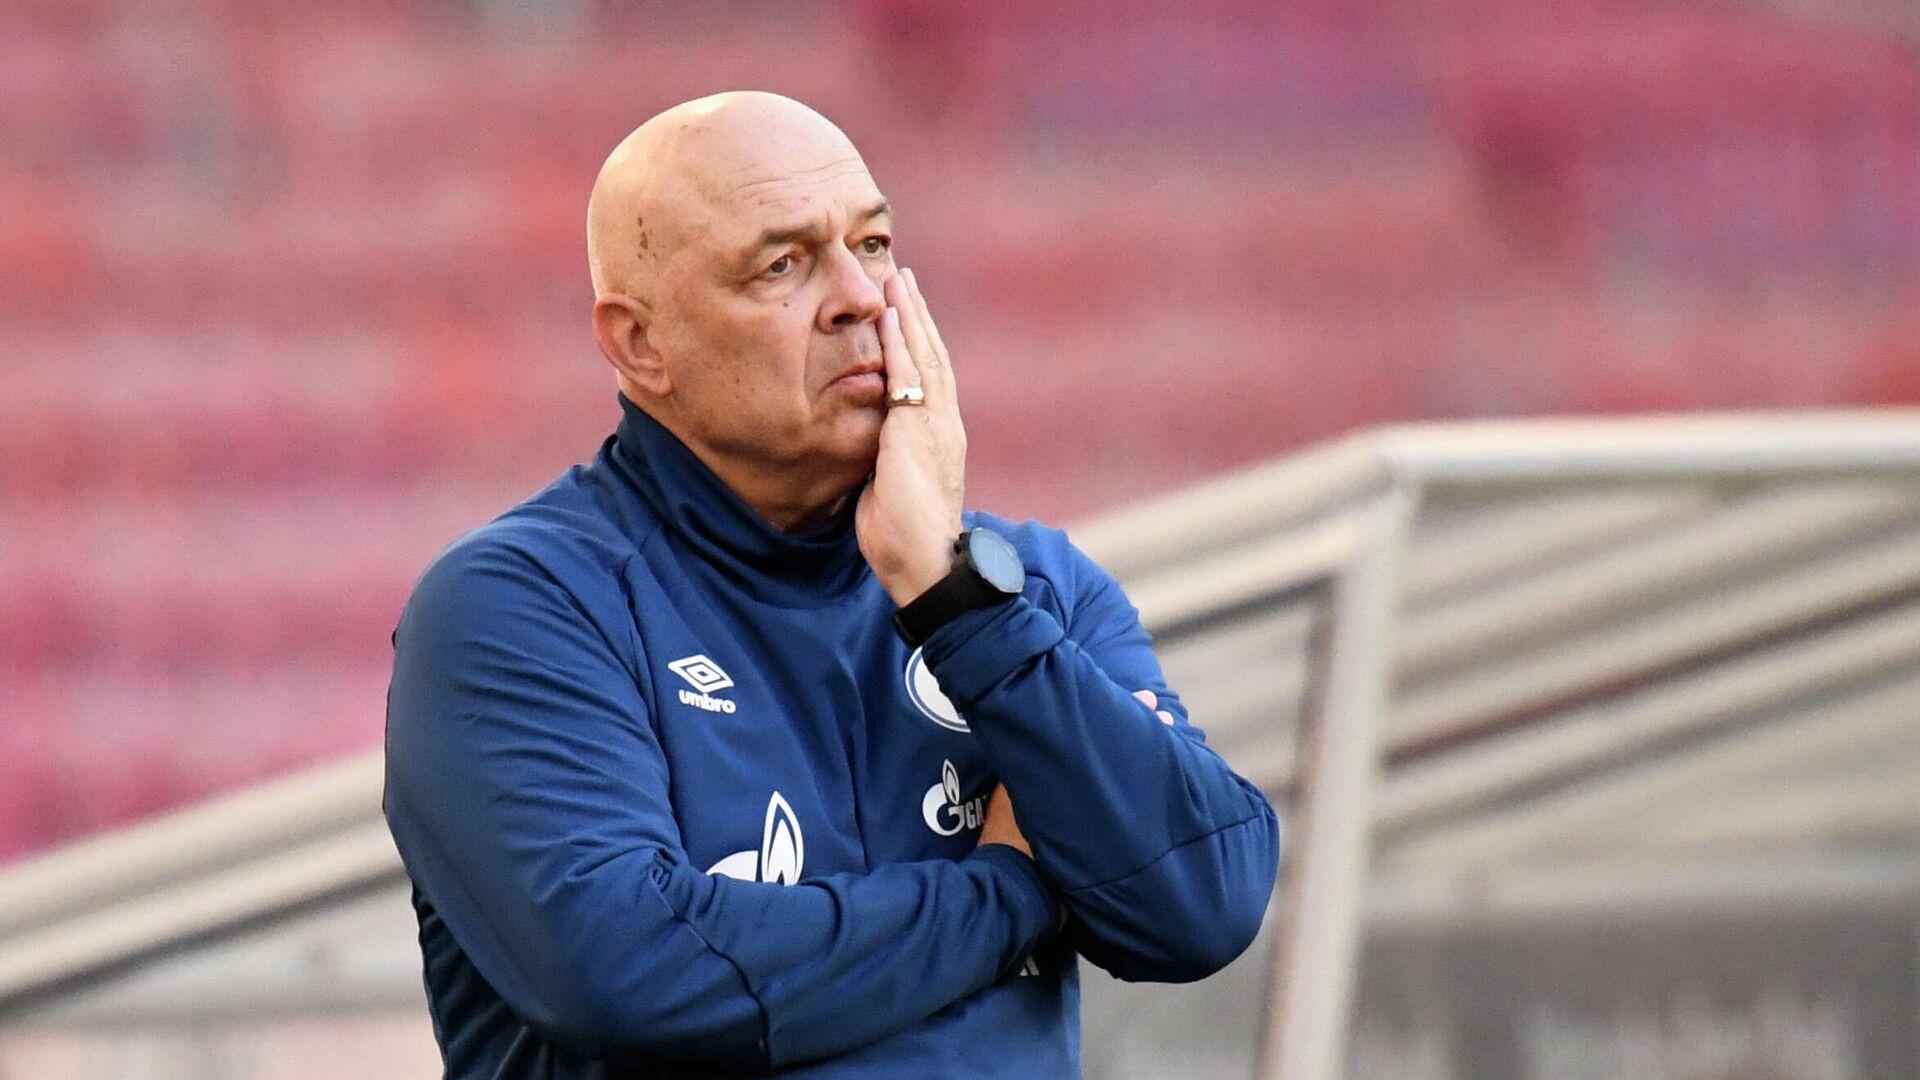 Trainer des FC Schalke 04 Christian Gross (Stuttgart, 27.02.2021) - SNA, 1920, 28.02.2021